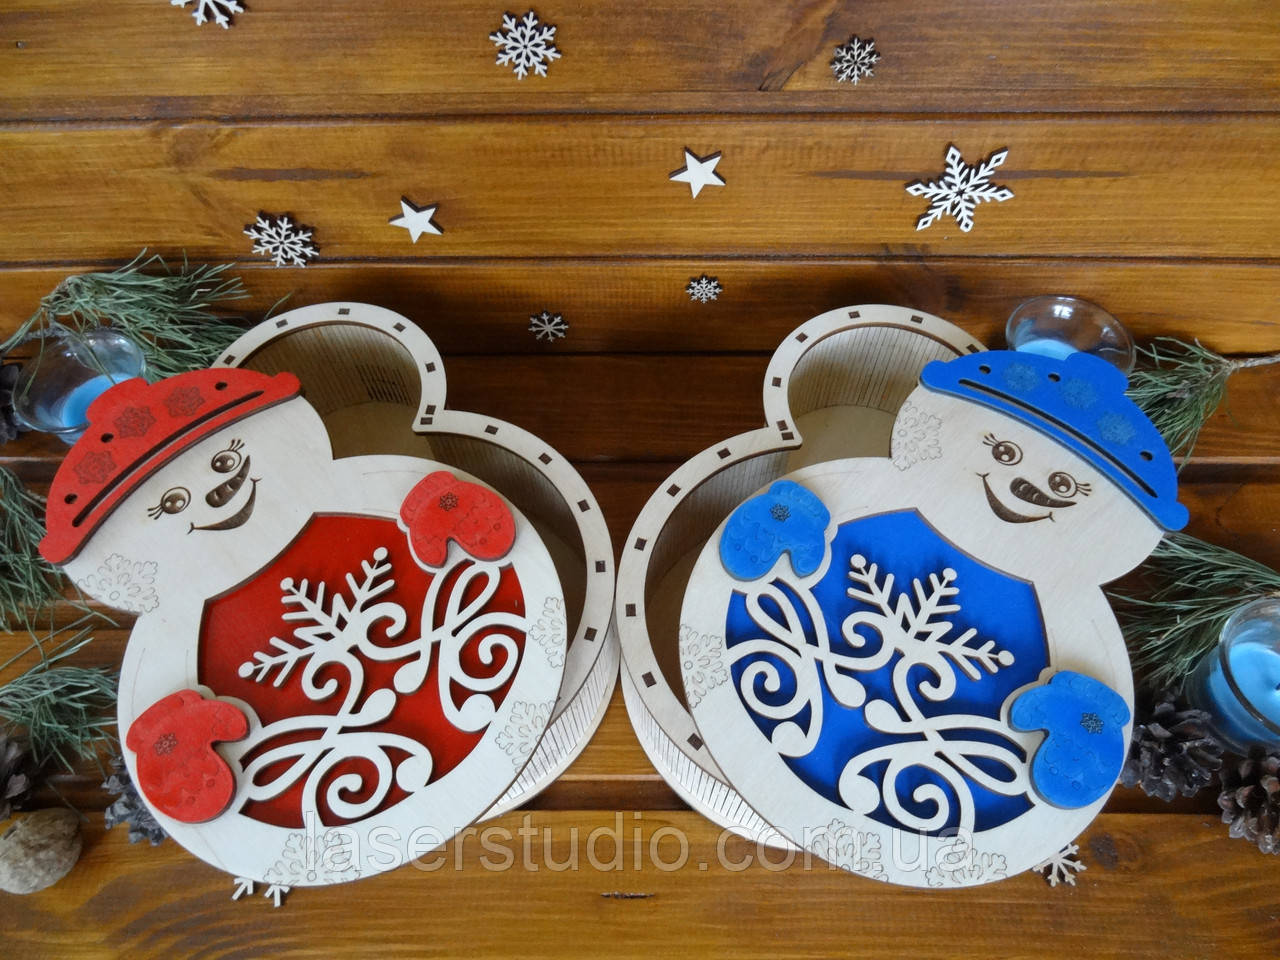 "Новогодняя подарочная коробка для конфет из дерева ""Снеговик""   Новогодний декор"